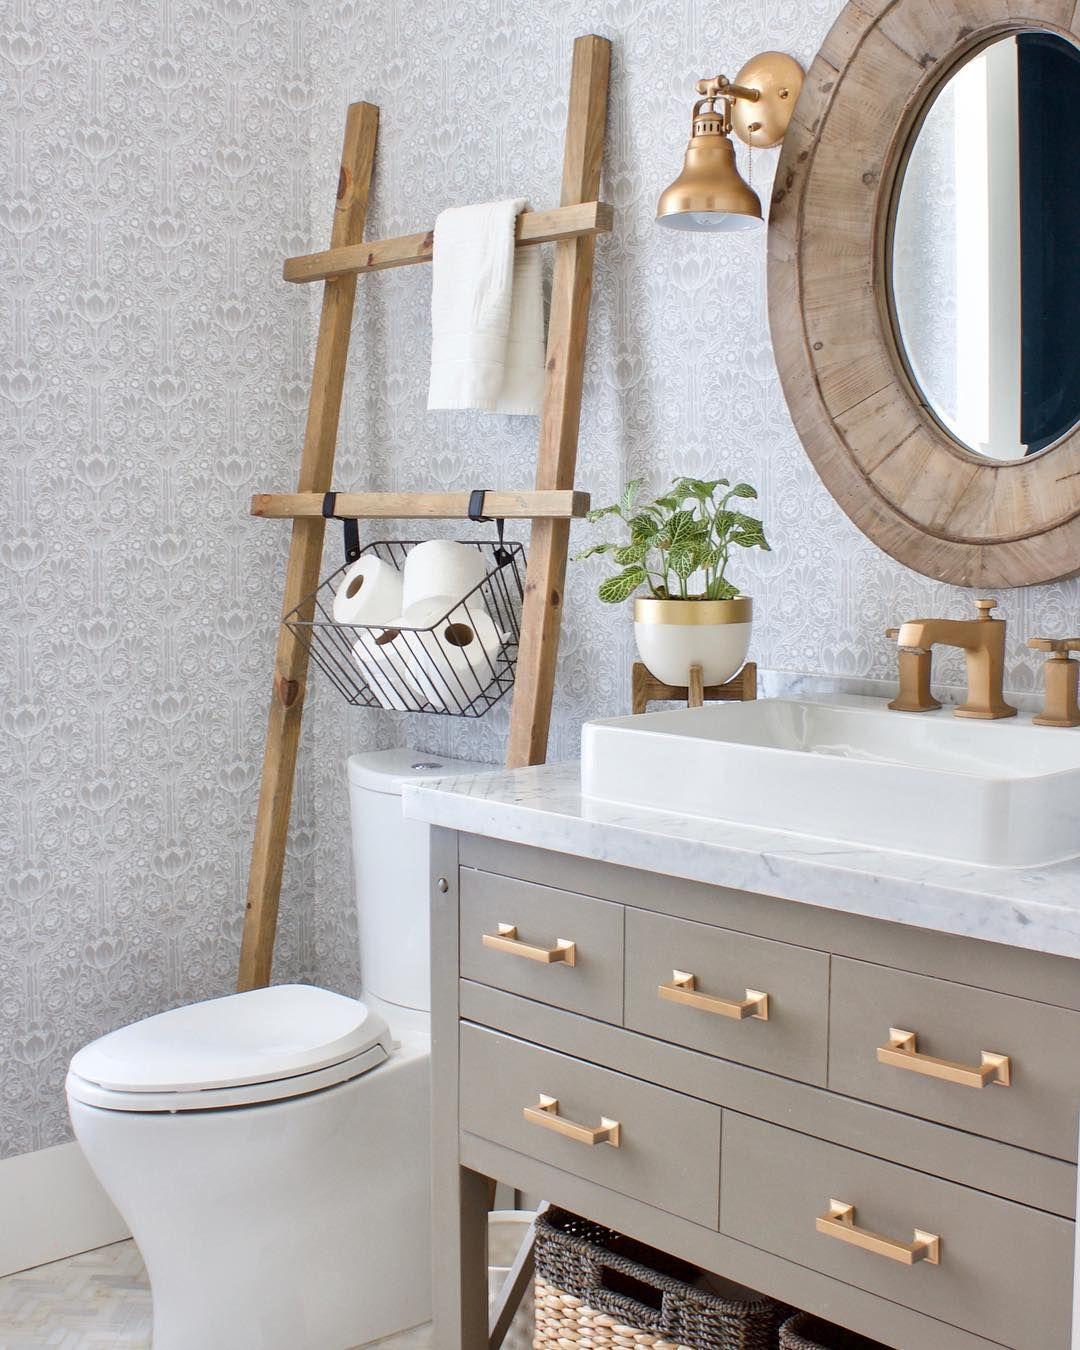 Ladder Shelf Over Toilet Bathroom Floor Storage Toilet Storage Bathroom Shelves Over Toilet